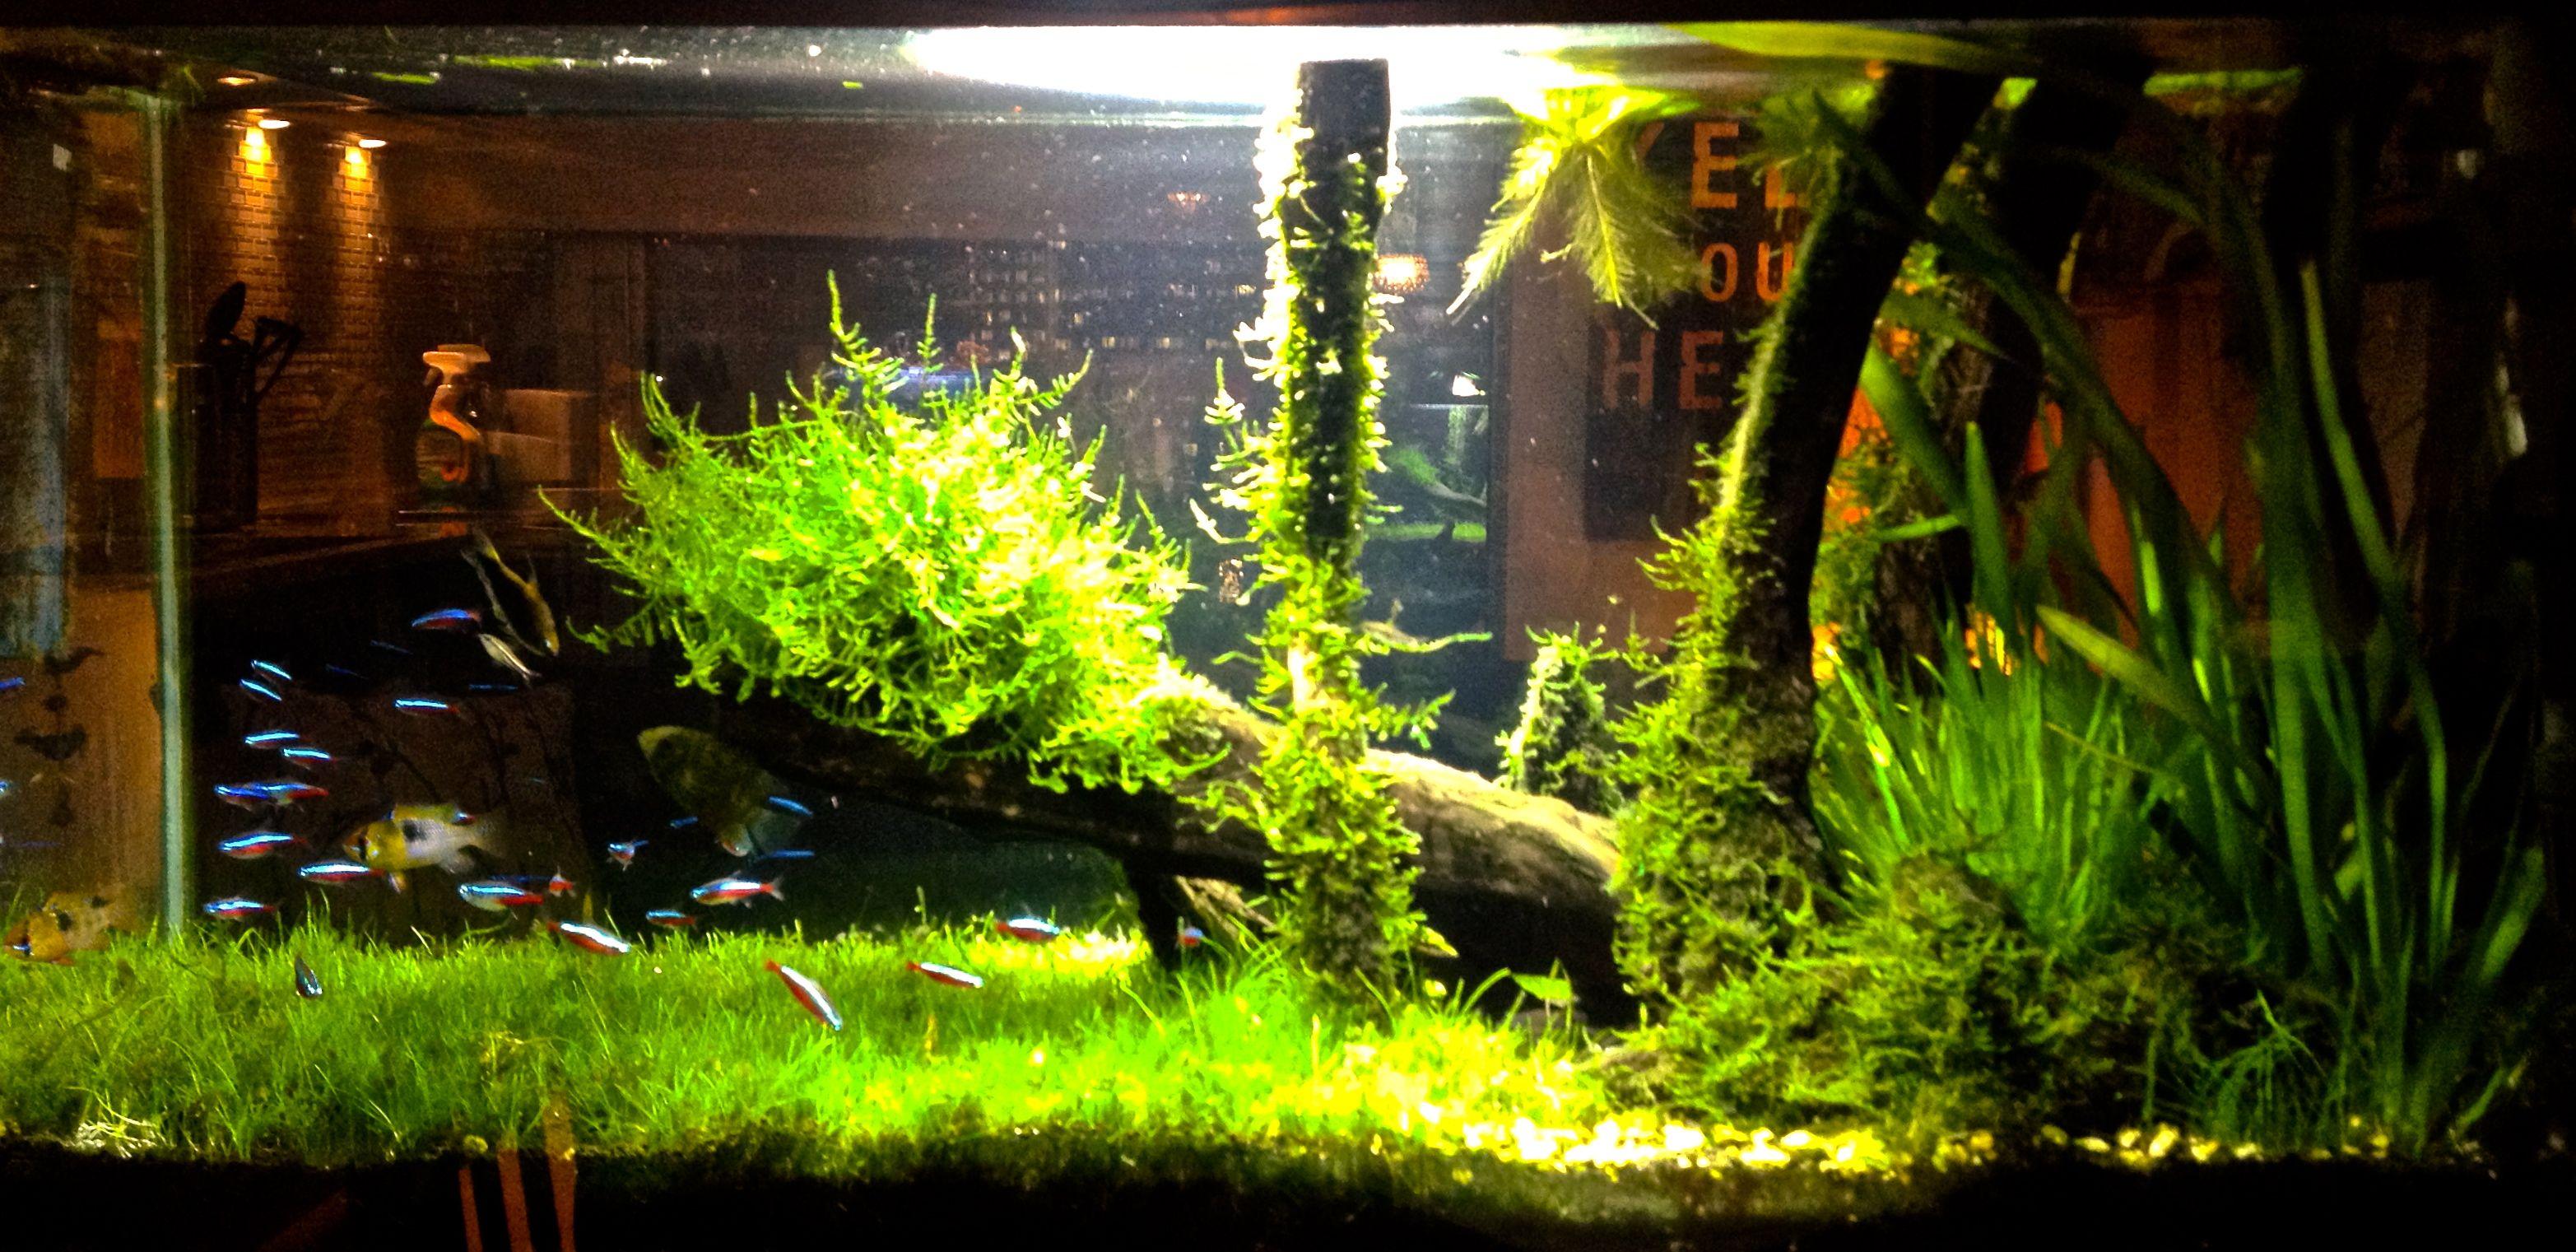 Fish for amazon aquarium - Night Time Shot Of My 30 Gallon Amazon Planted Tank Set Up Fish Aquariumsaquarium